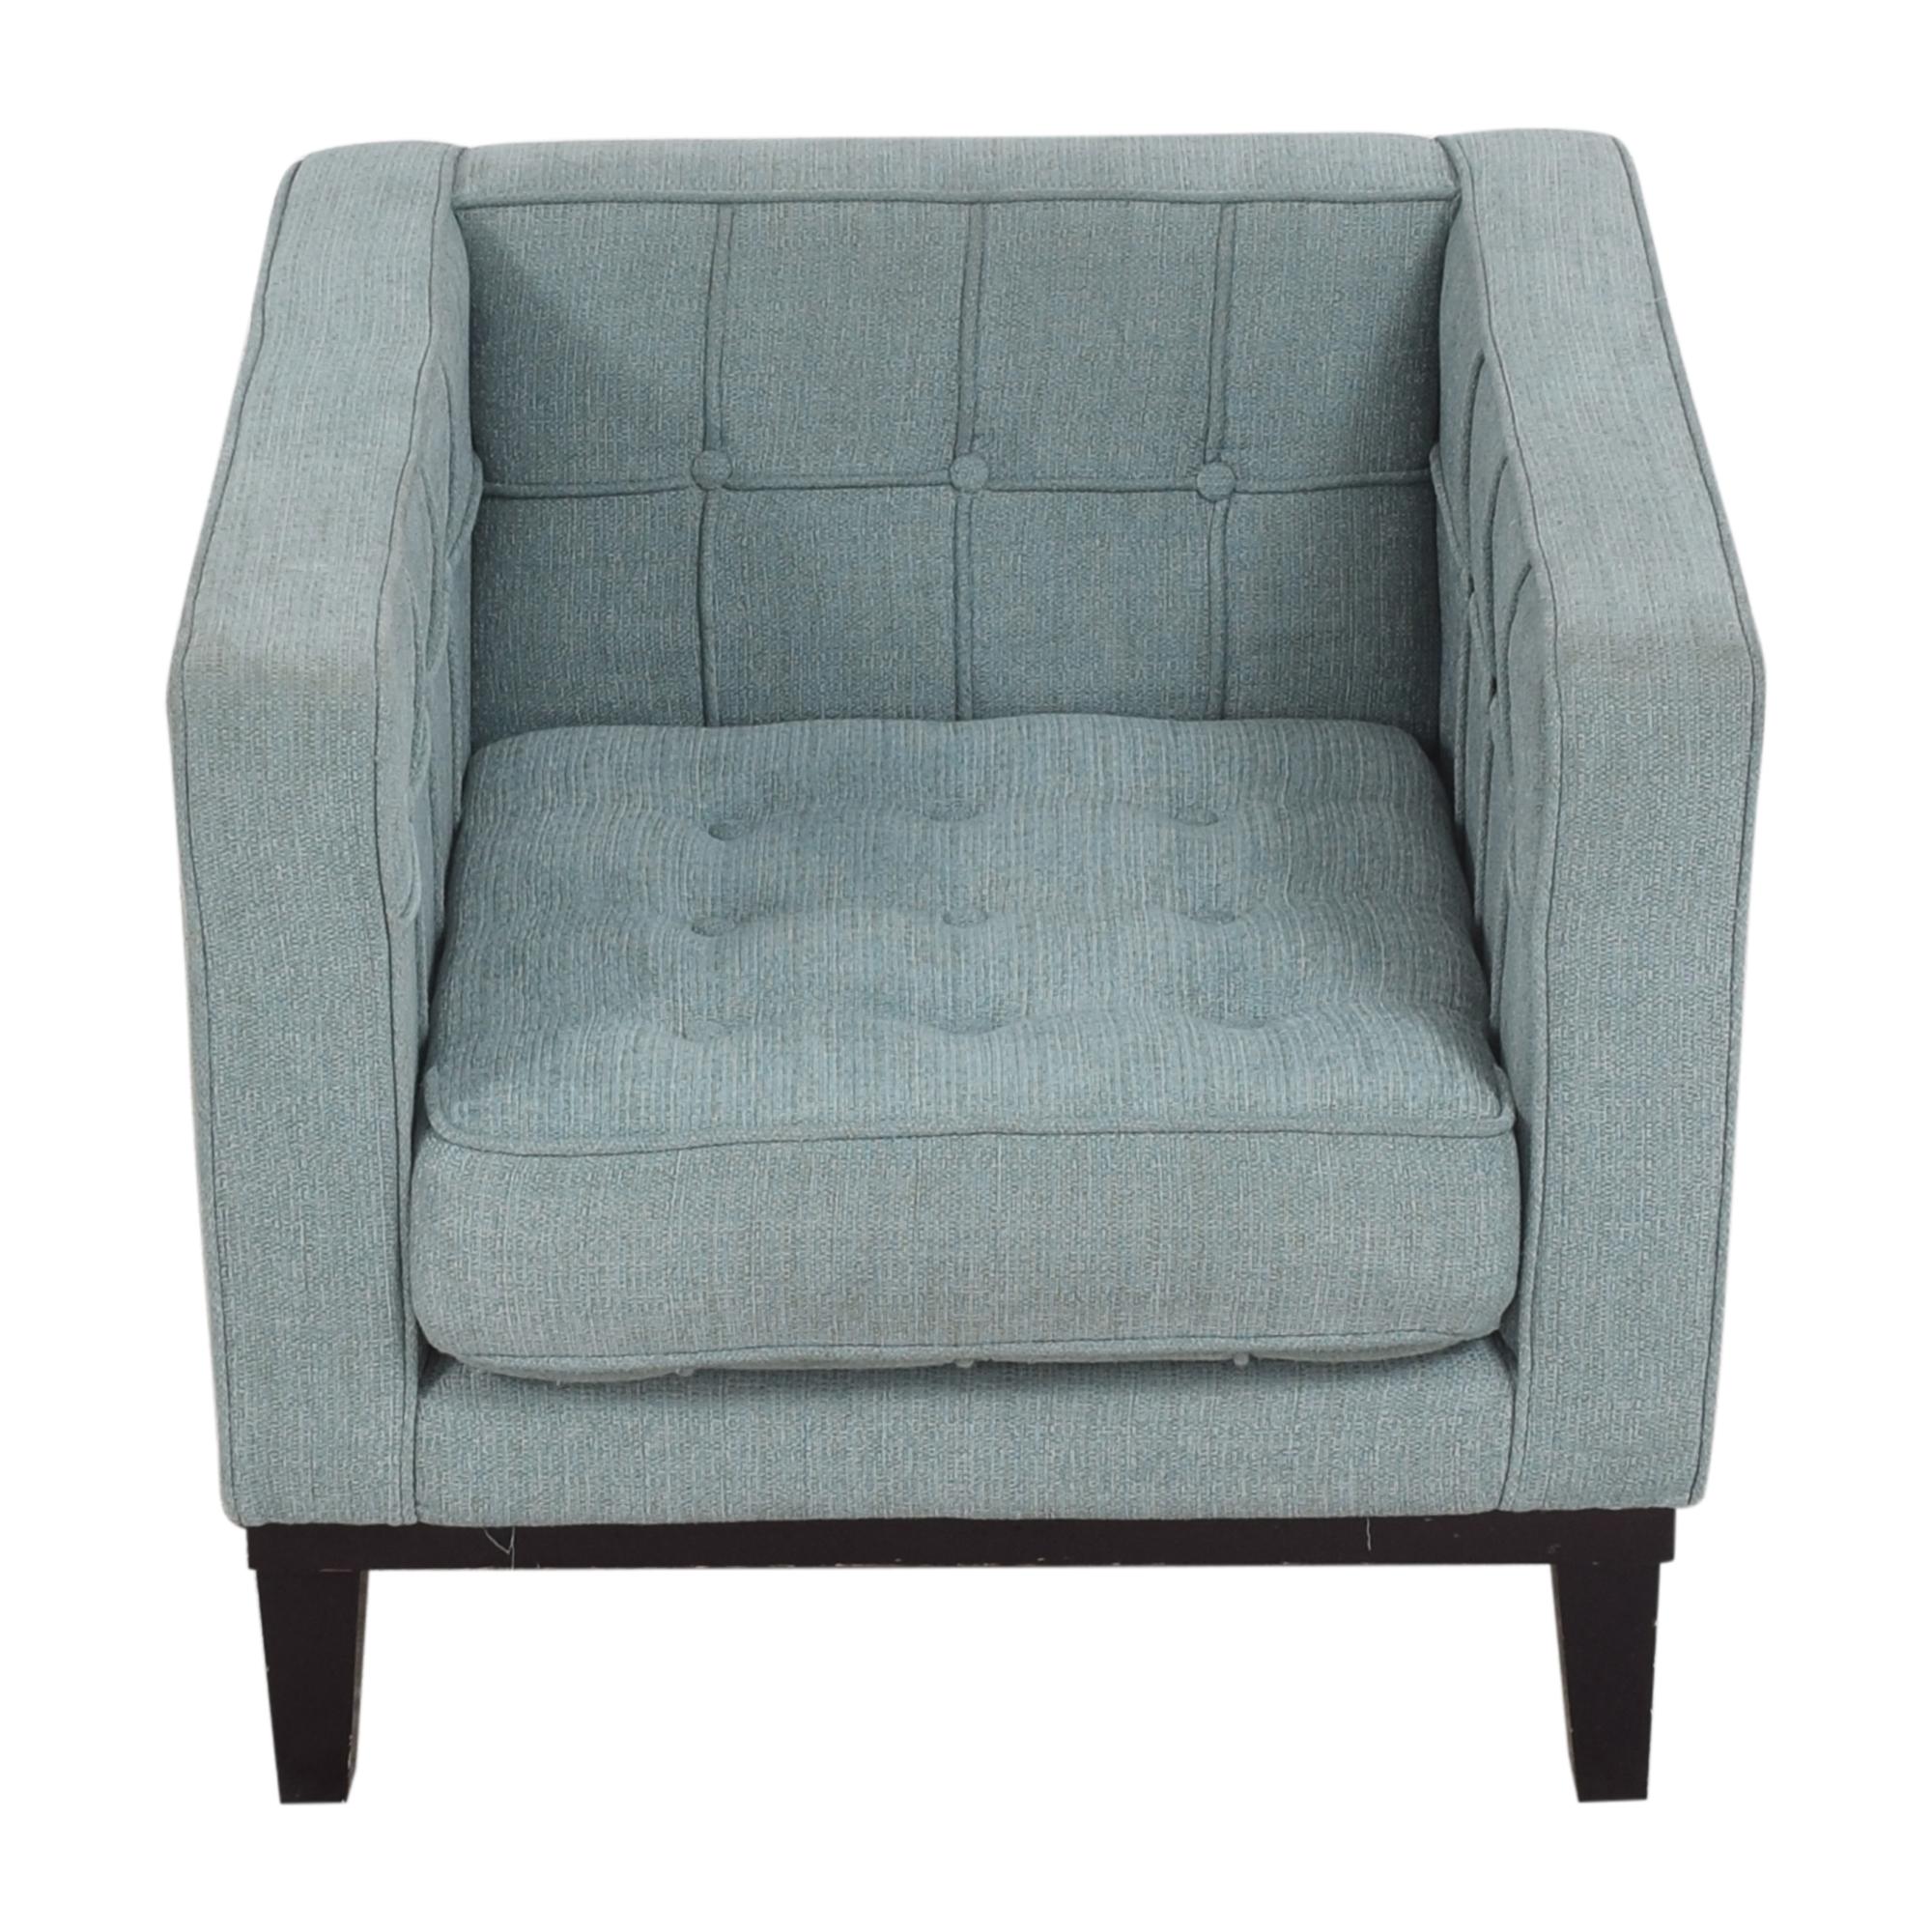 buy Armen Living Club Chair Armen Living Accent Chairs